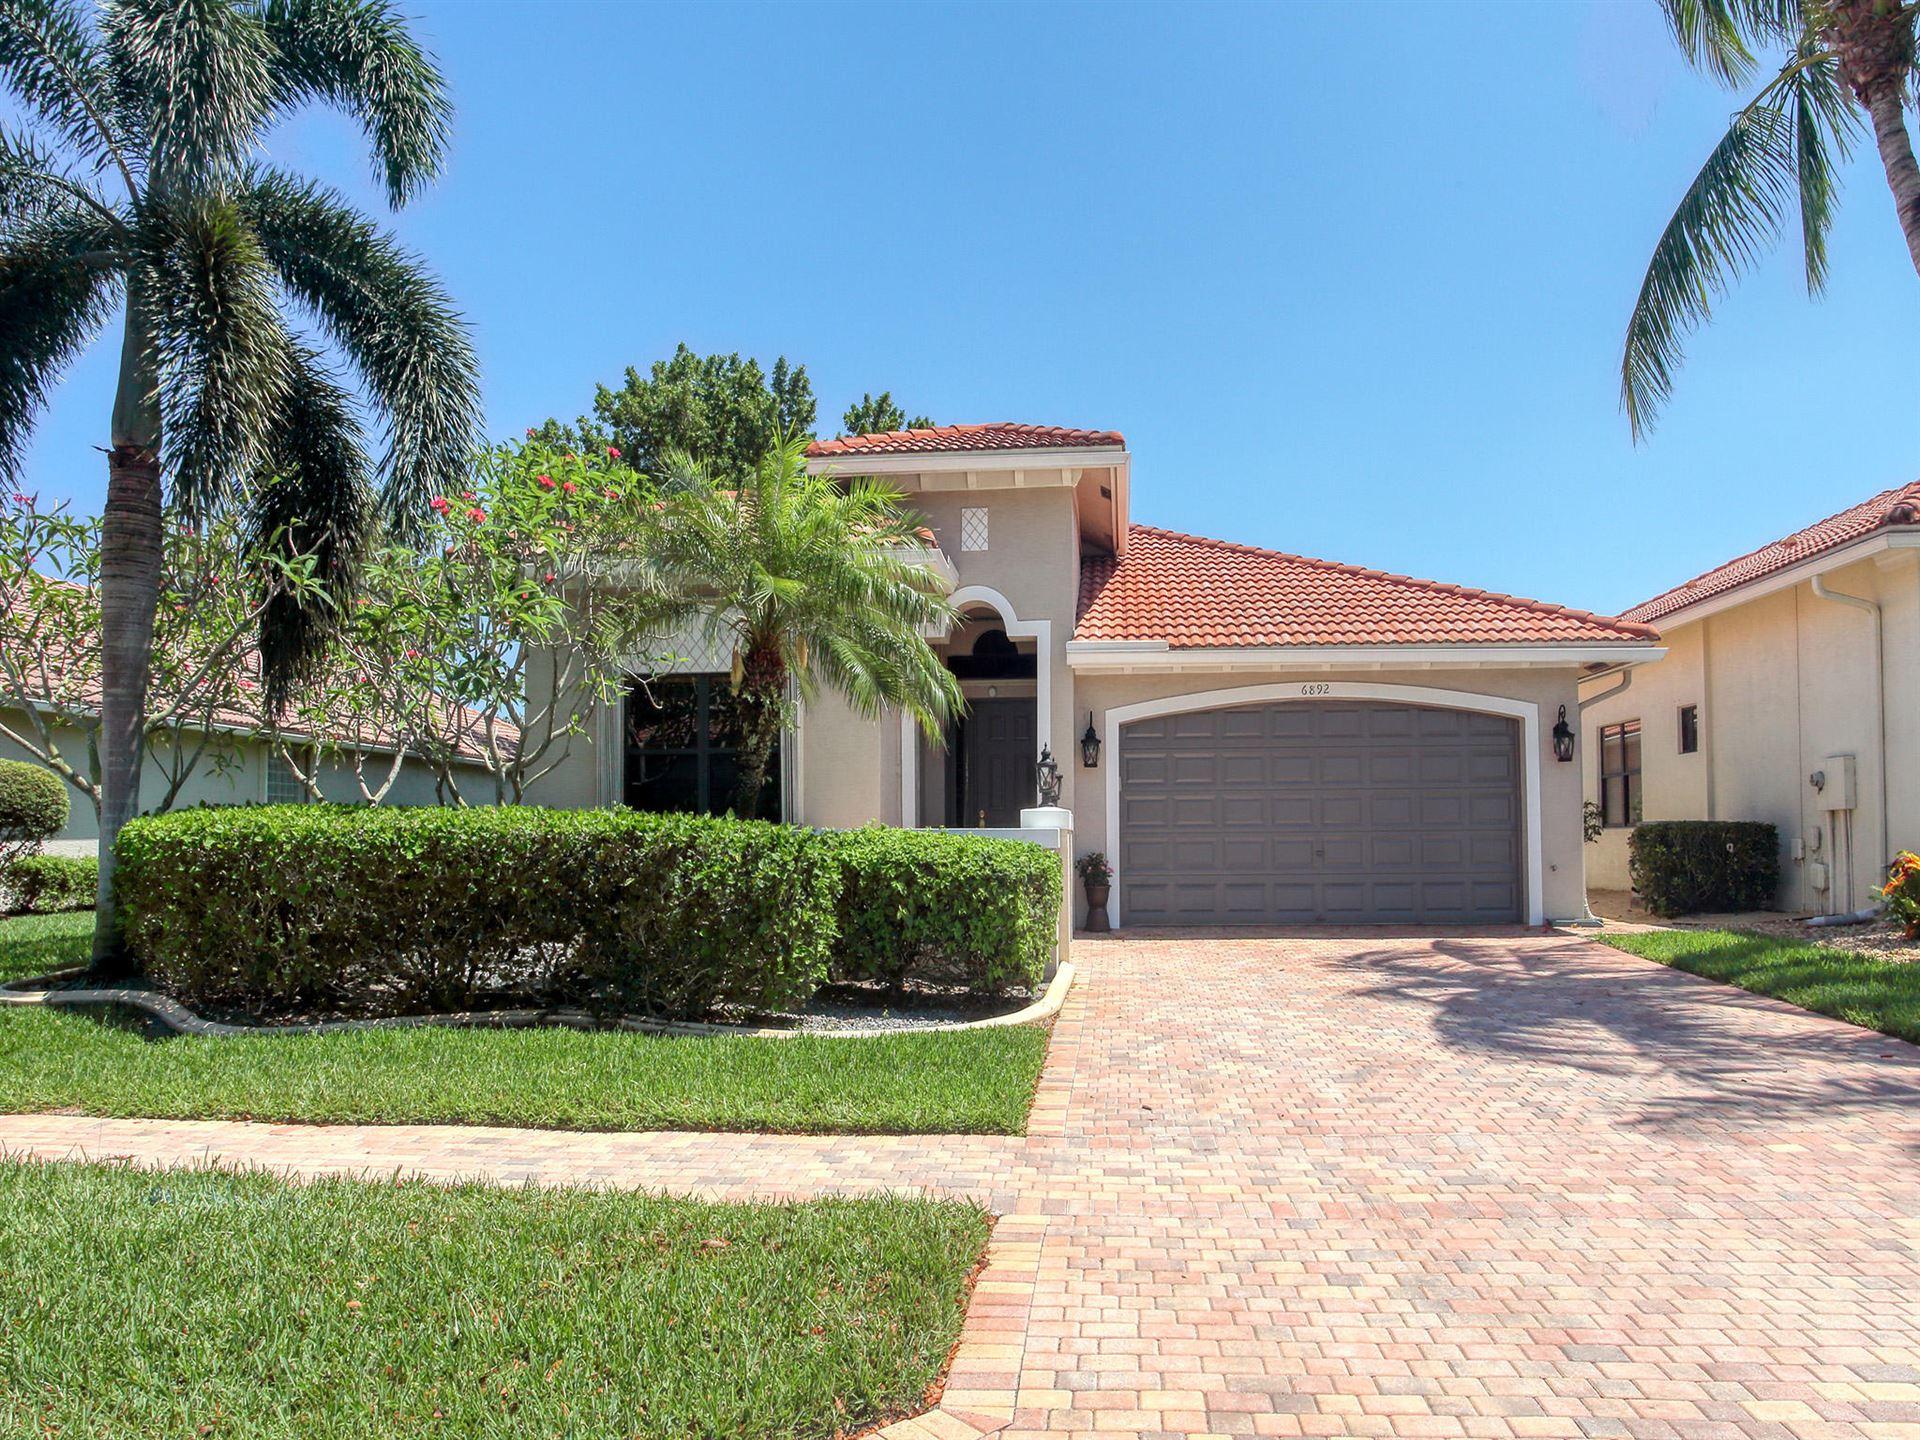 6892 Adriano Drive, Boynton Beach, FL 33437 - MLS#: RX-10714177